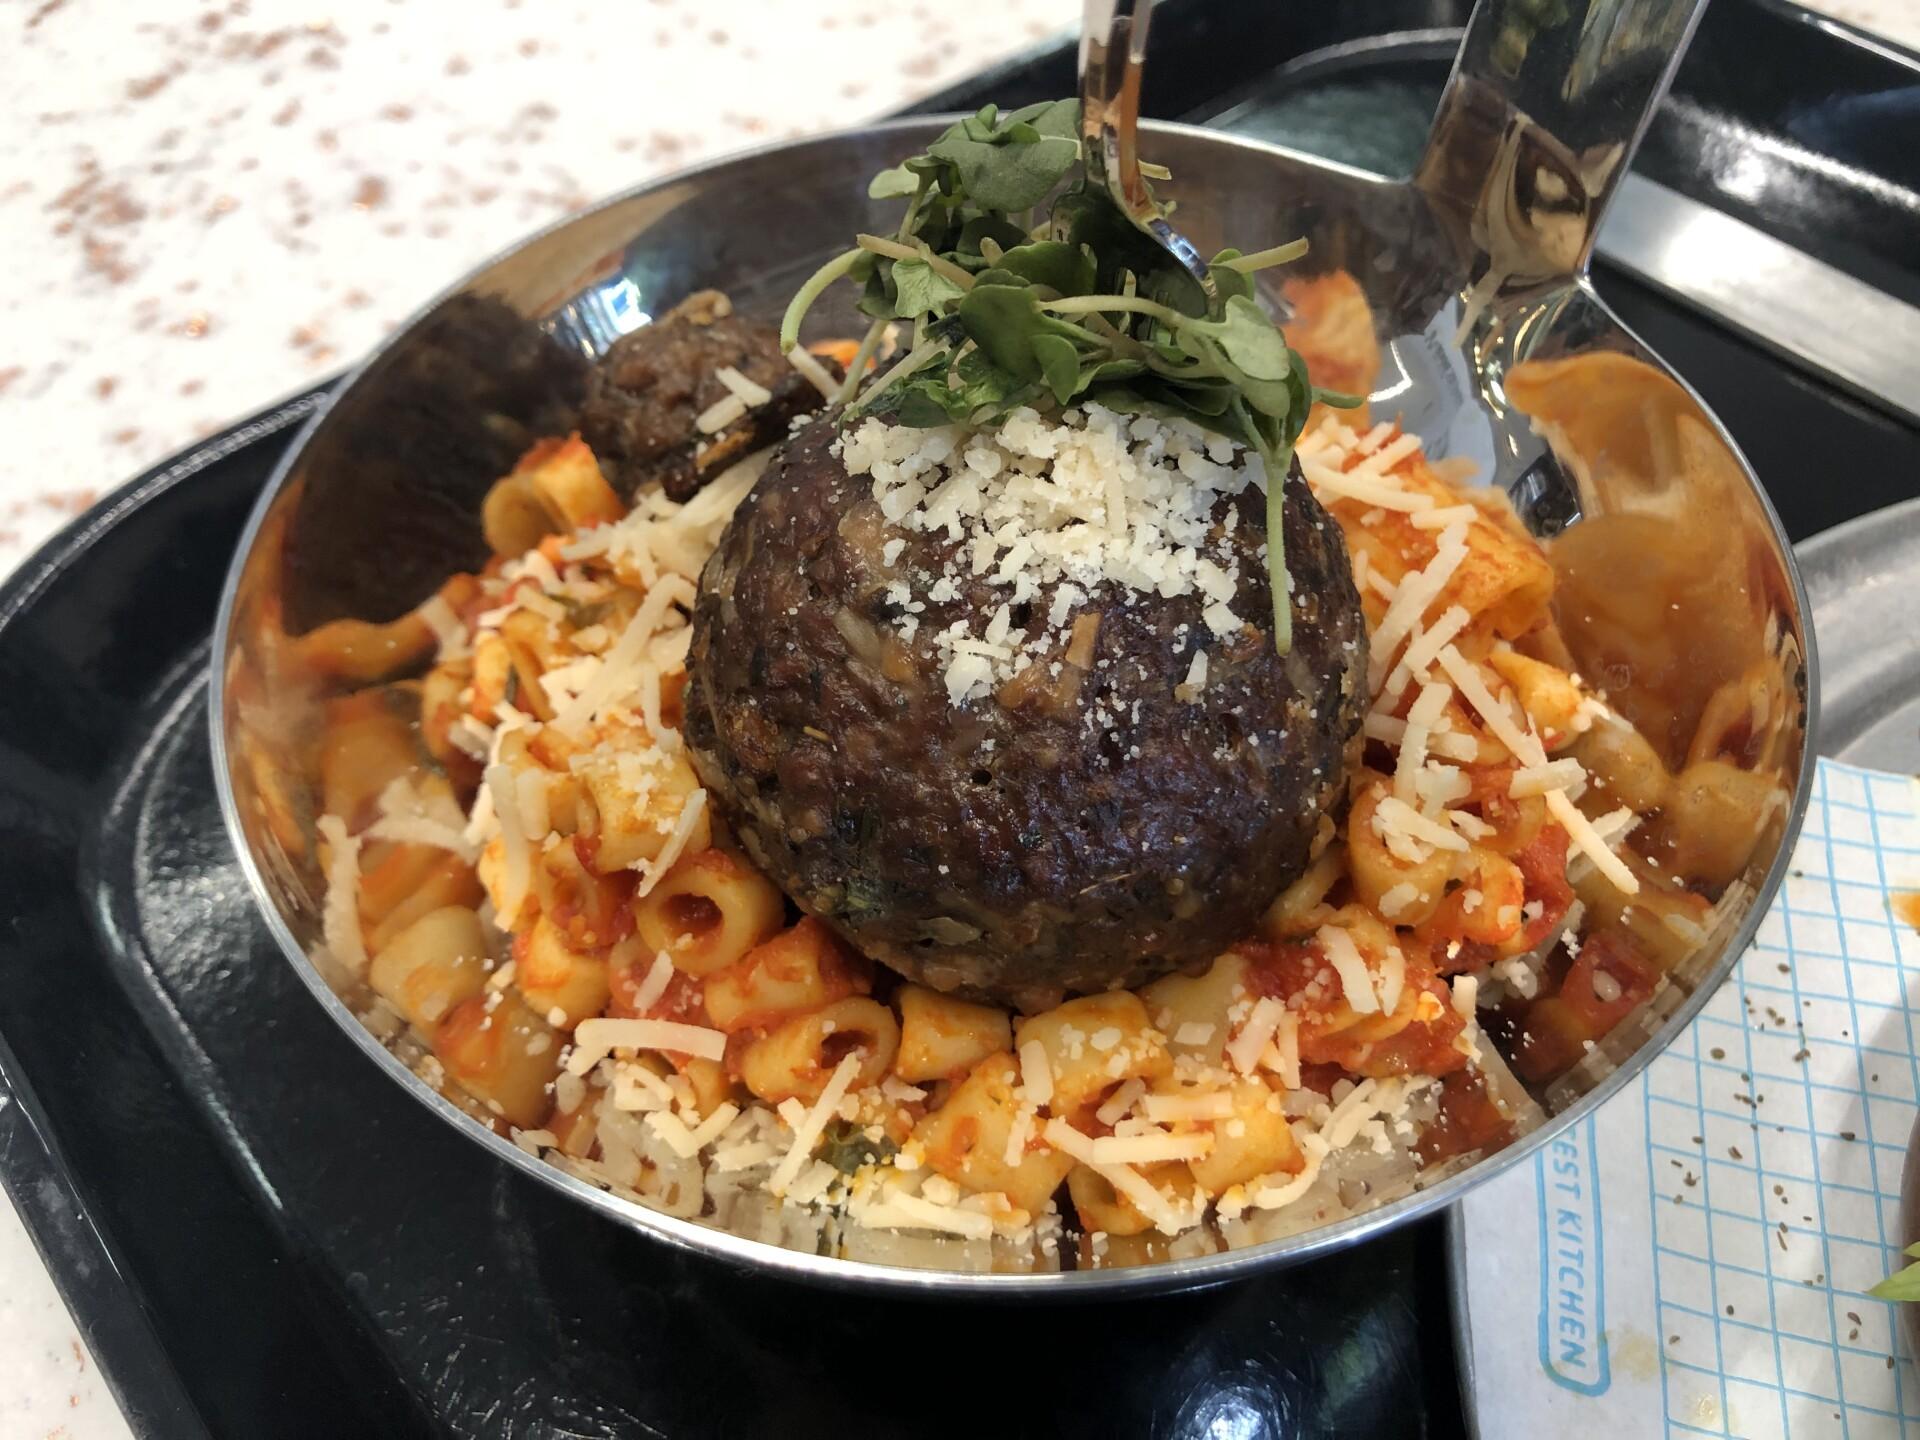 pym test kitchen meatball_2.JPG